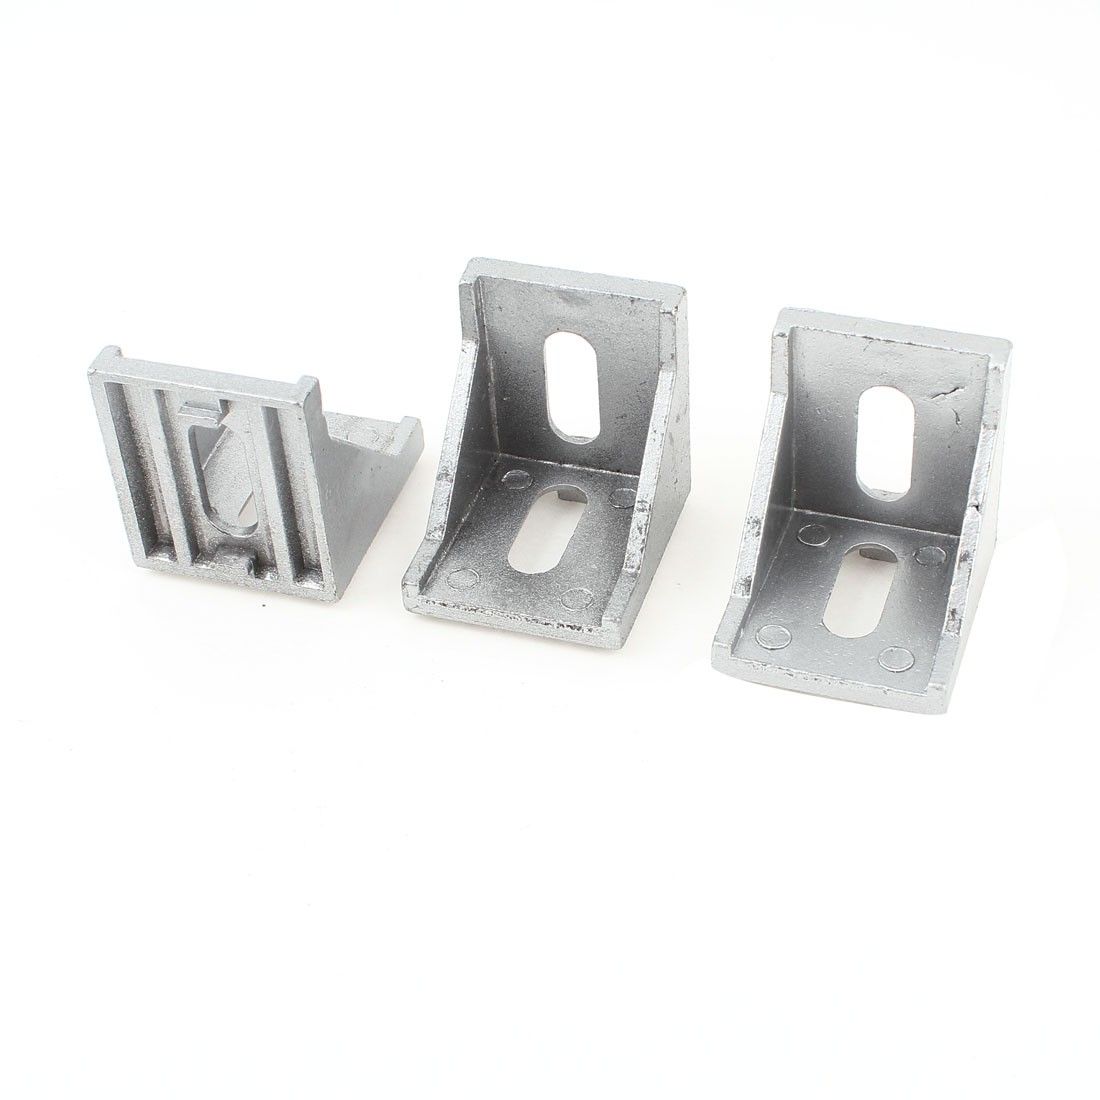 3 Pcs Silver Tone Metal 90 Degree Door Angle Bracket 40mm x 40mm